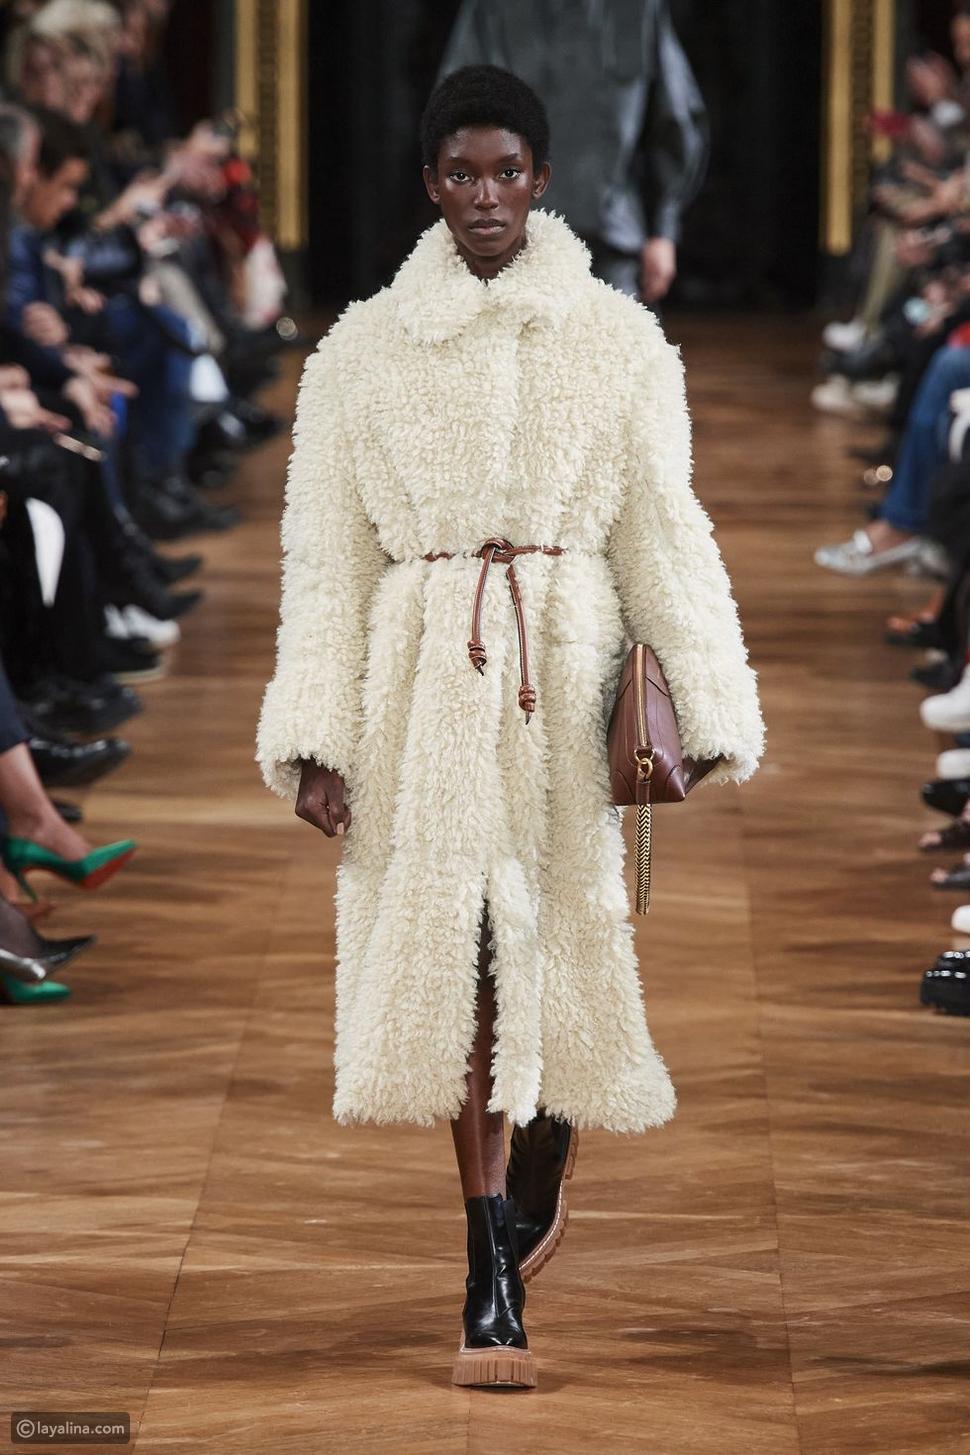 معاطف فروFuzzy all over coats